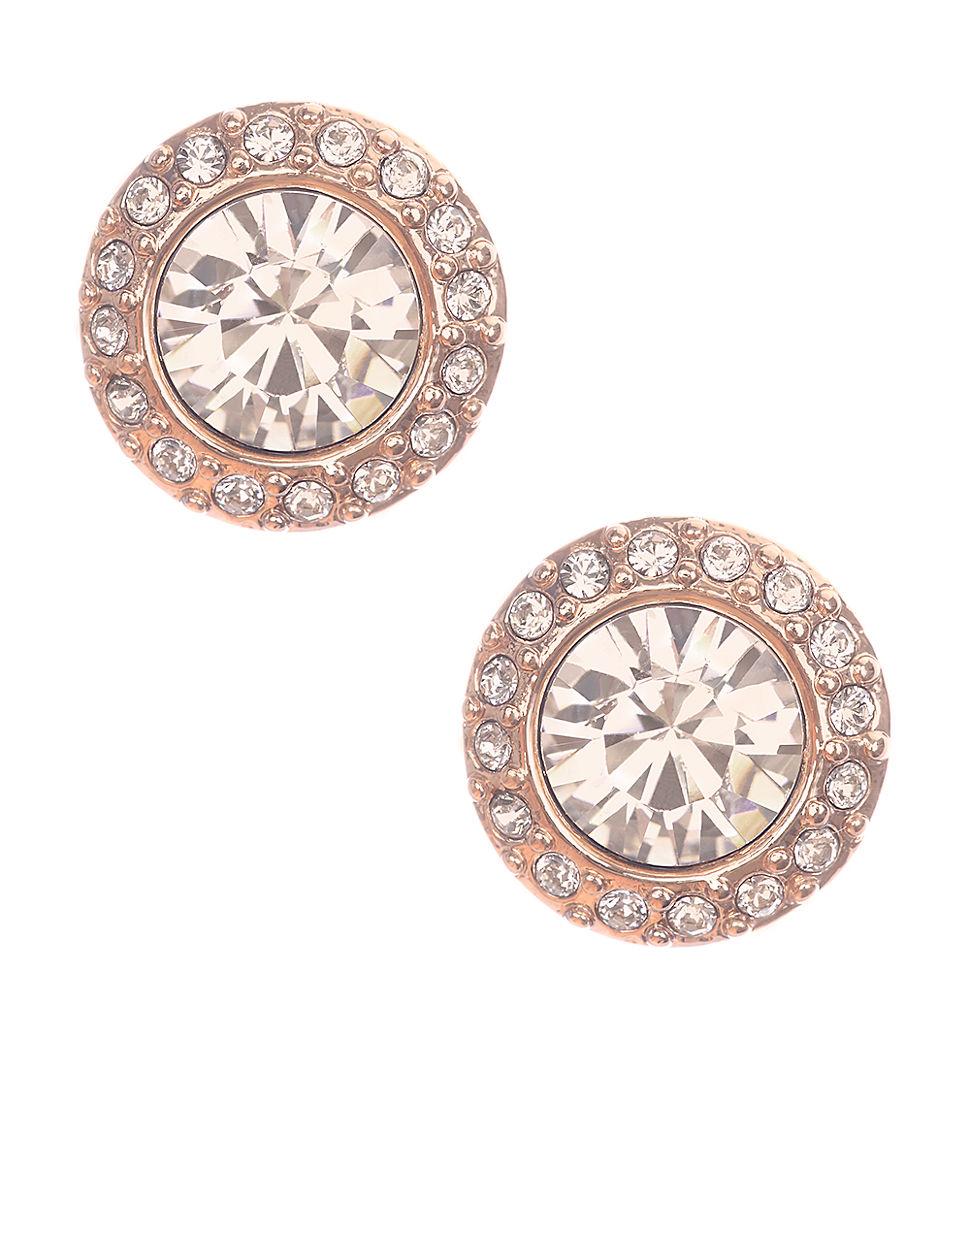 e138ec4ec Givenchy Rose Goldtone And Swarovski Crystal Stud Earrings in Pink ...